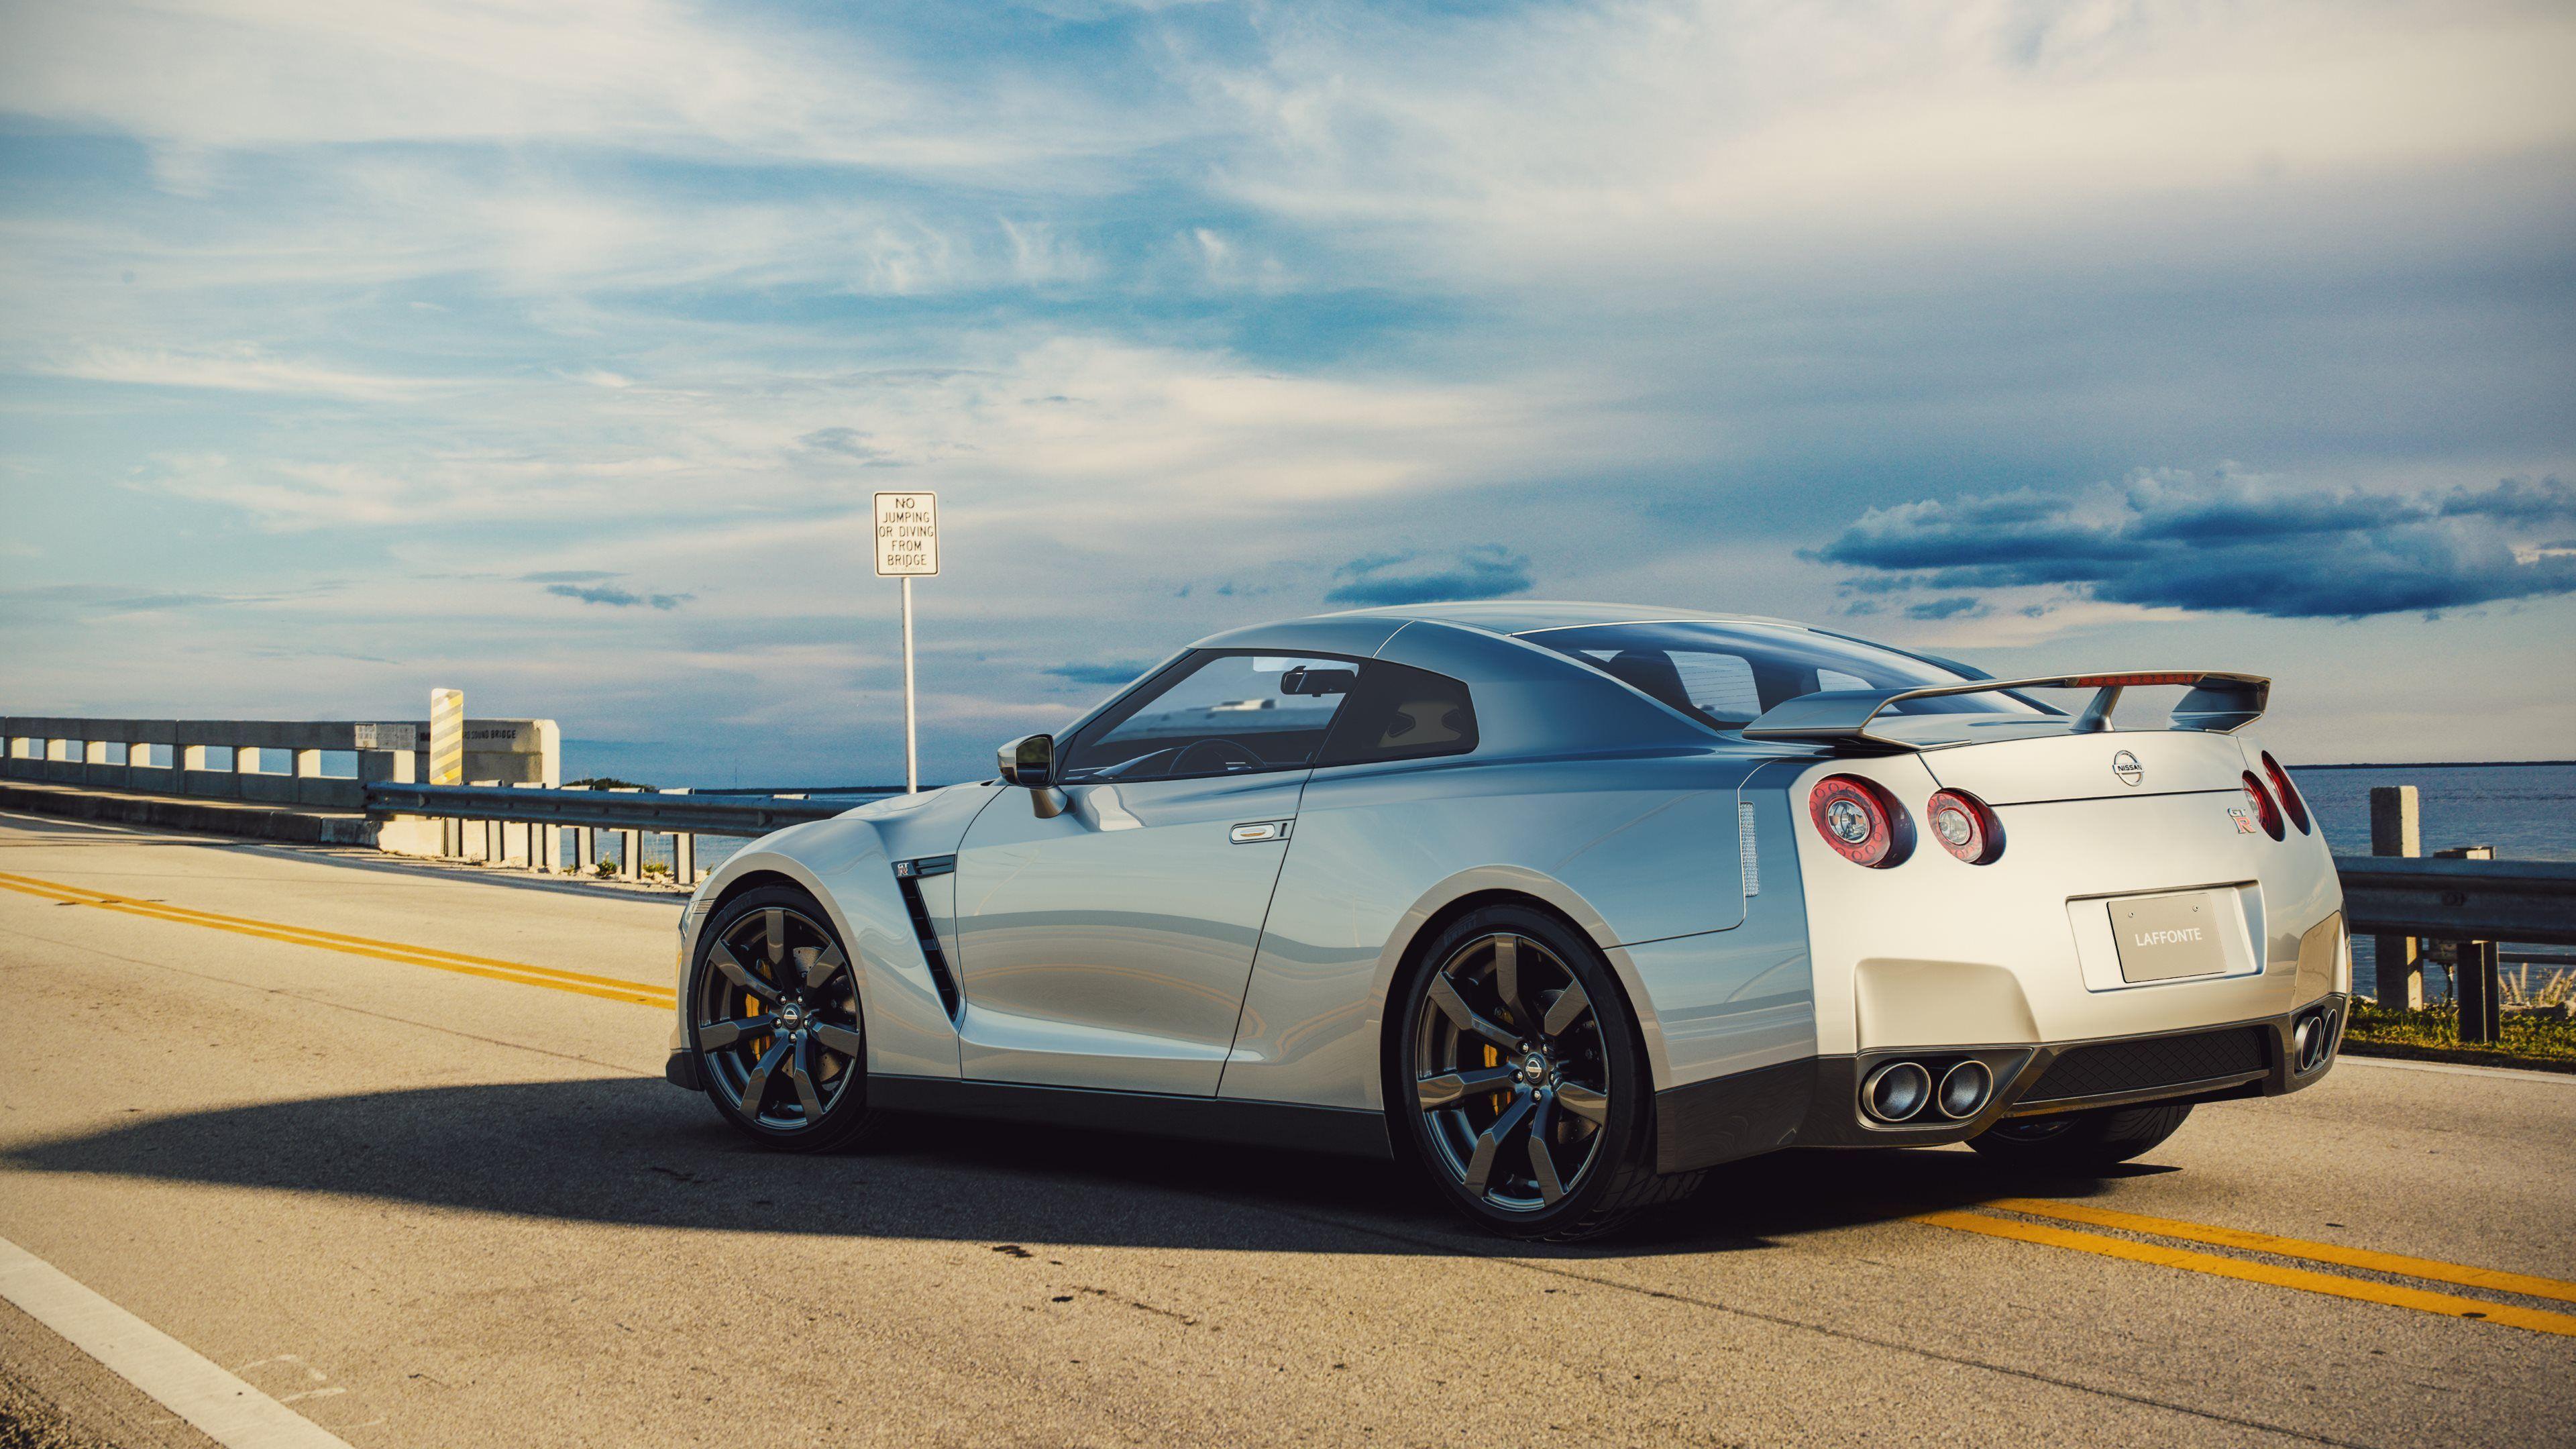 41 Best Free Nissan Gt R 4k Wallpapers Wallpaperaccess